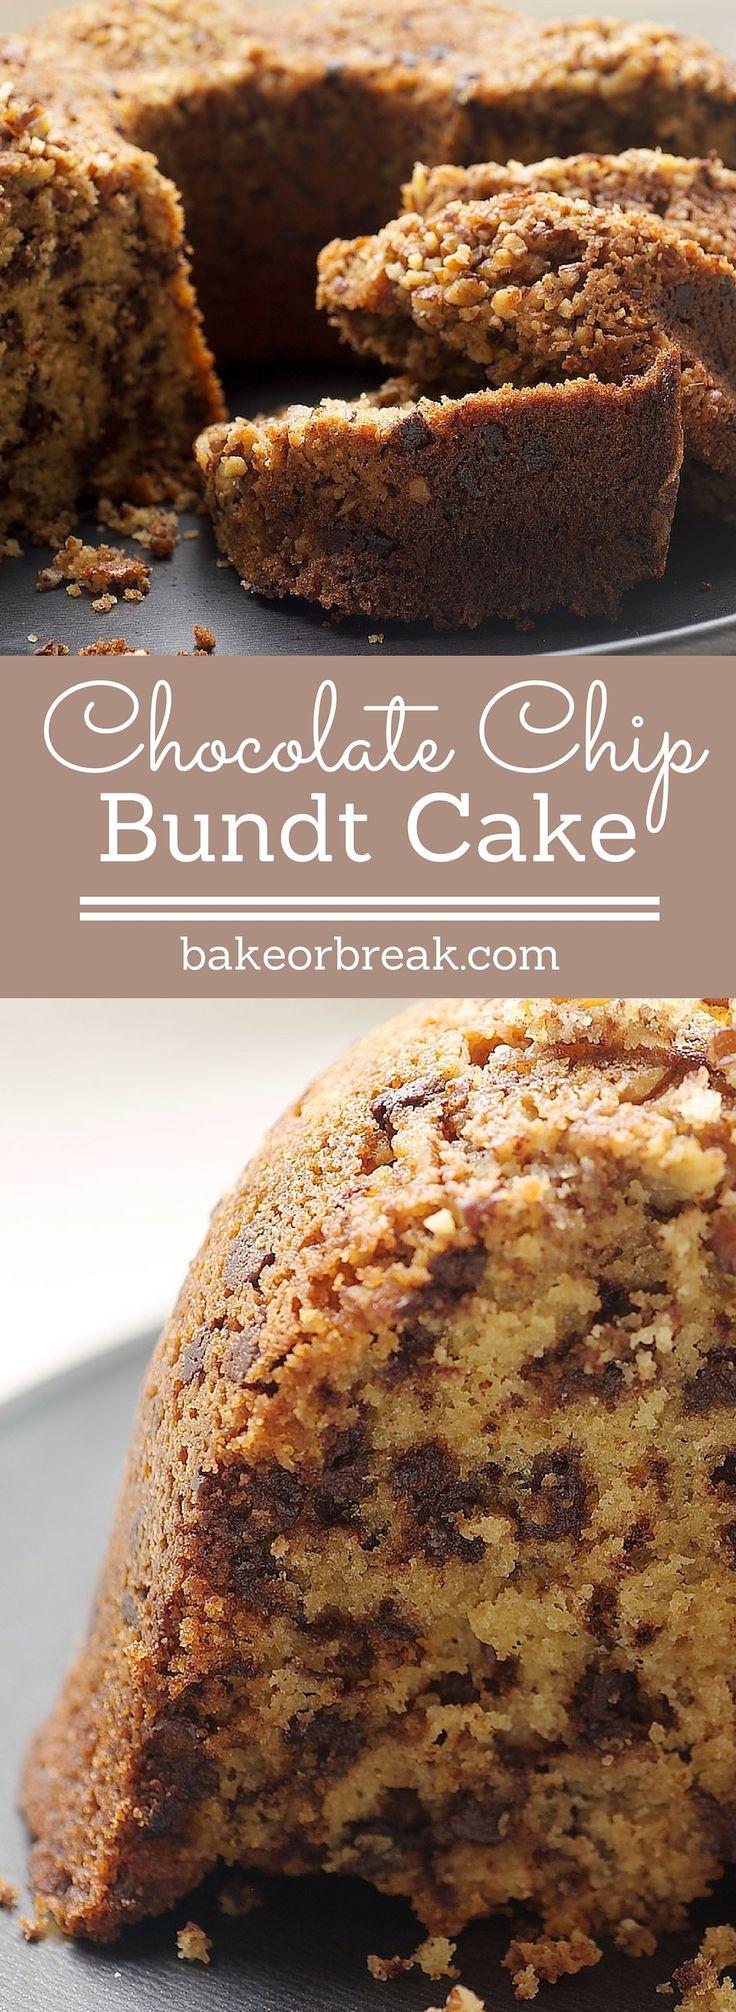 Chocolate chip bundt cake recipe chocolate chip bundt